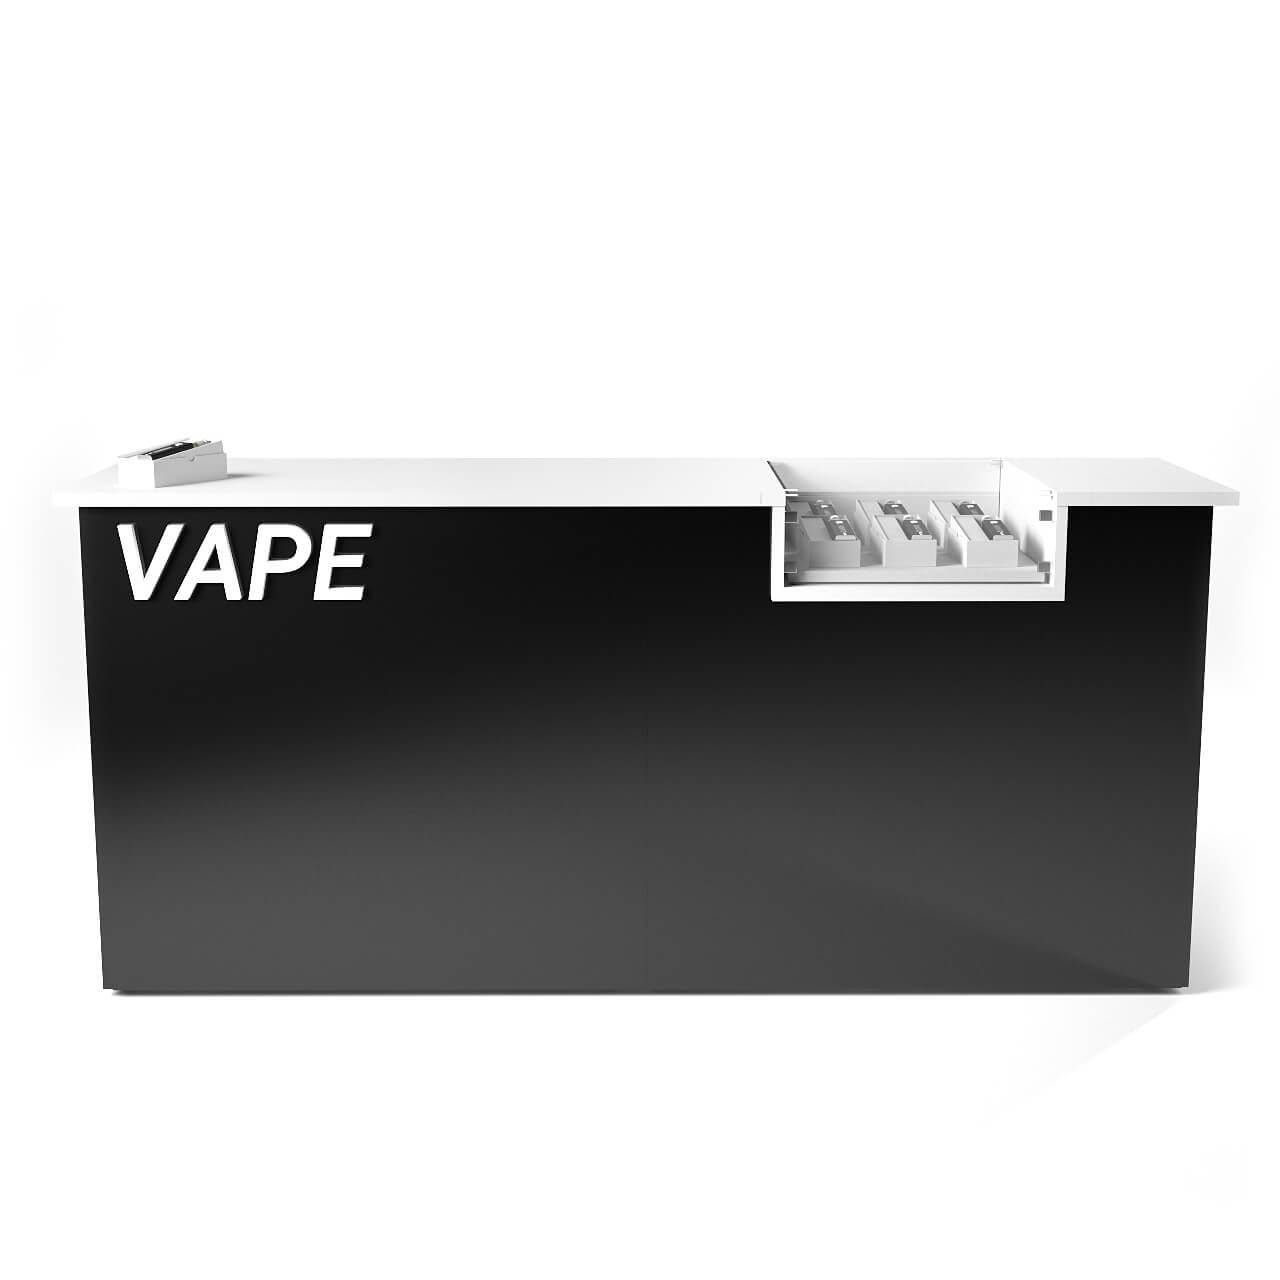 E-Zigaretten Theke